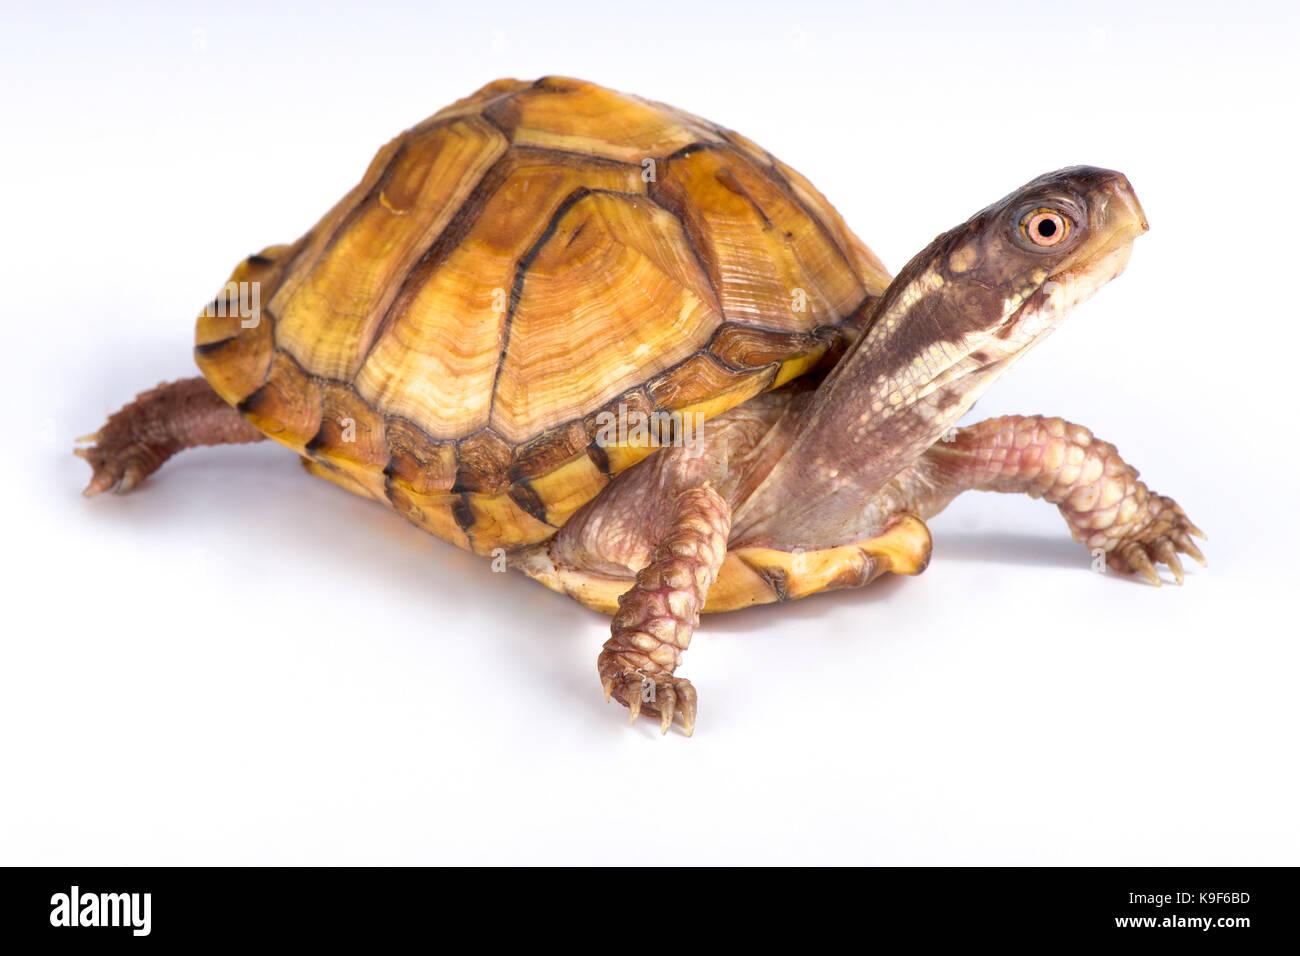 Gulf Coast box turtle, Terrapene carolina major - Stock Image